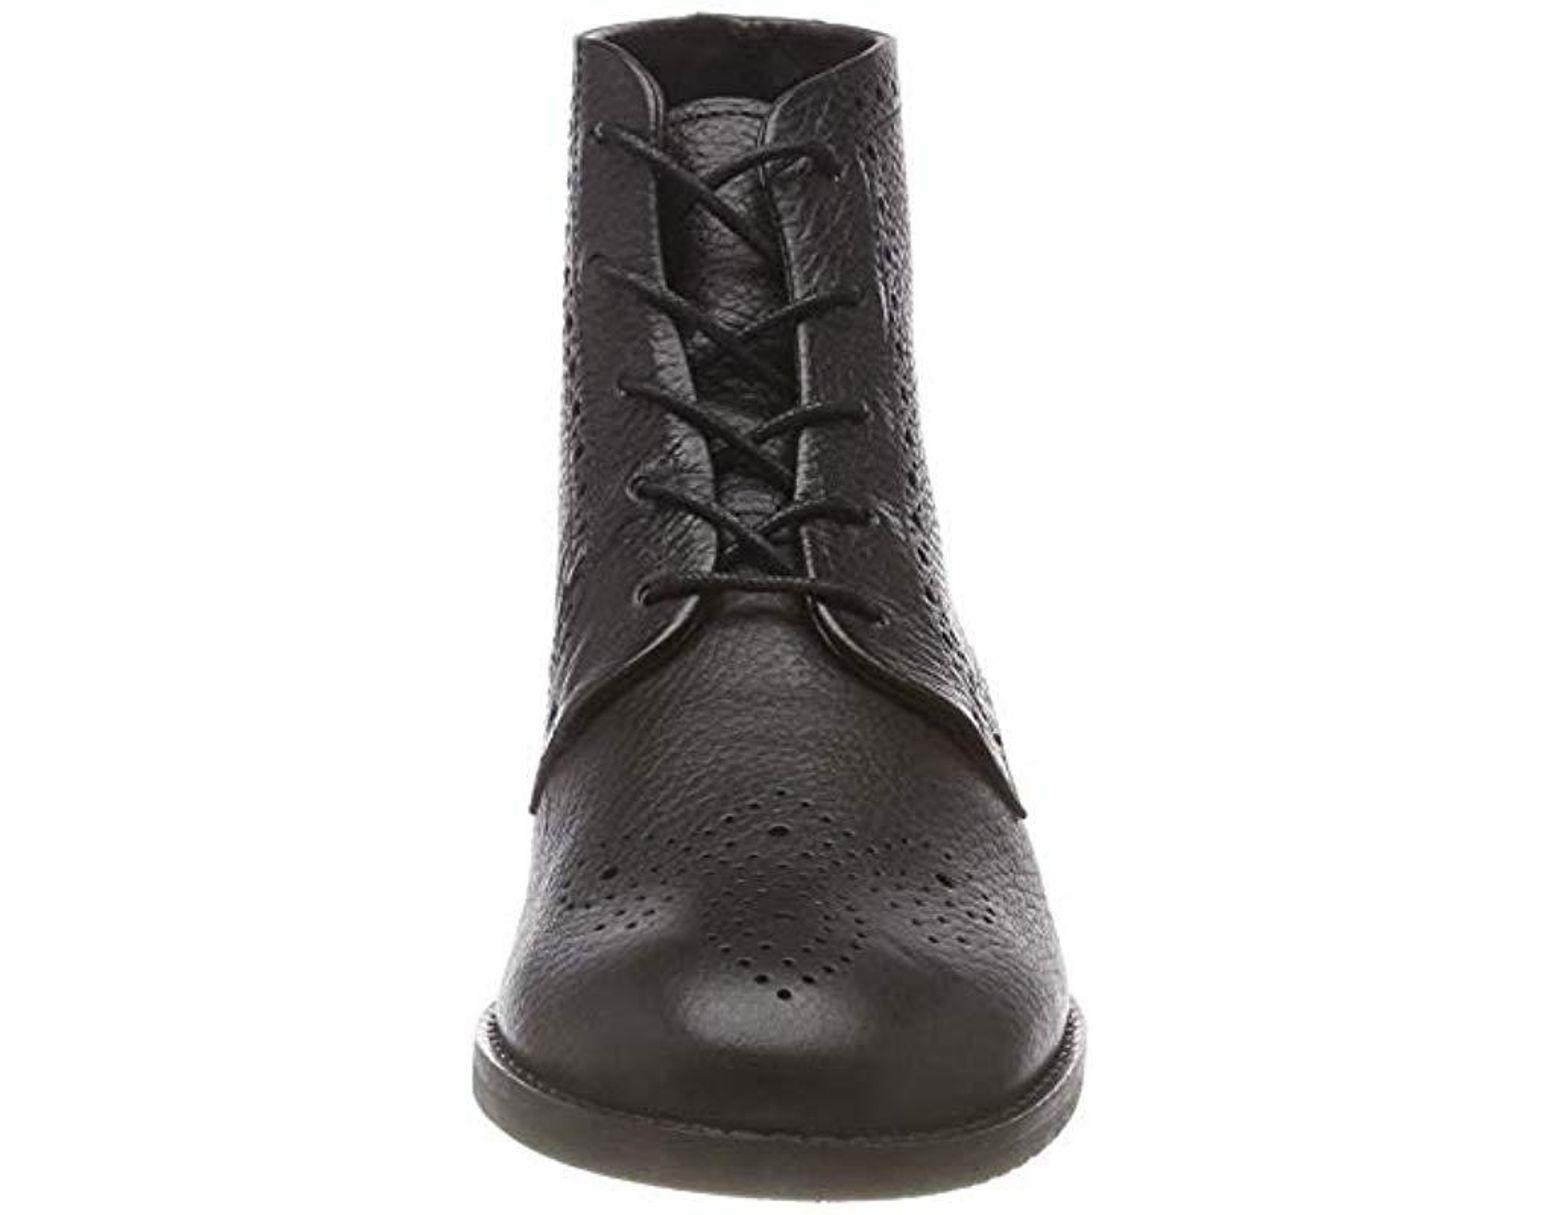 6f1dc7cd Clarks Netley Freya Ankle Boots in Black - Lyst